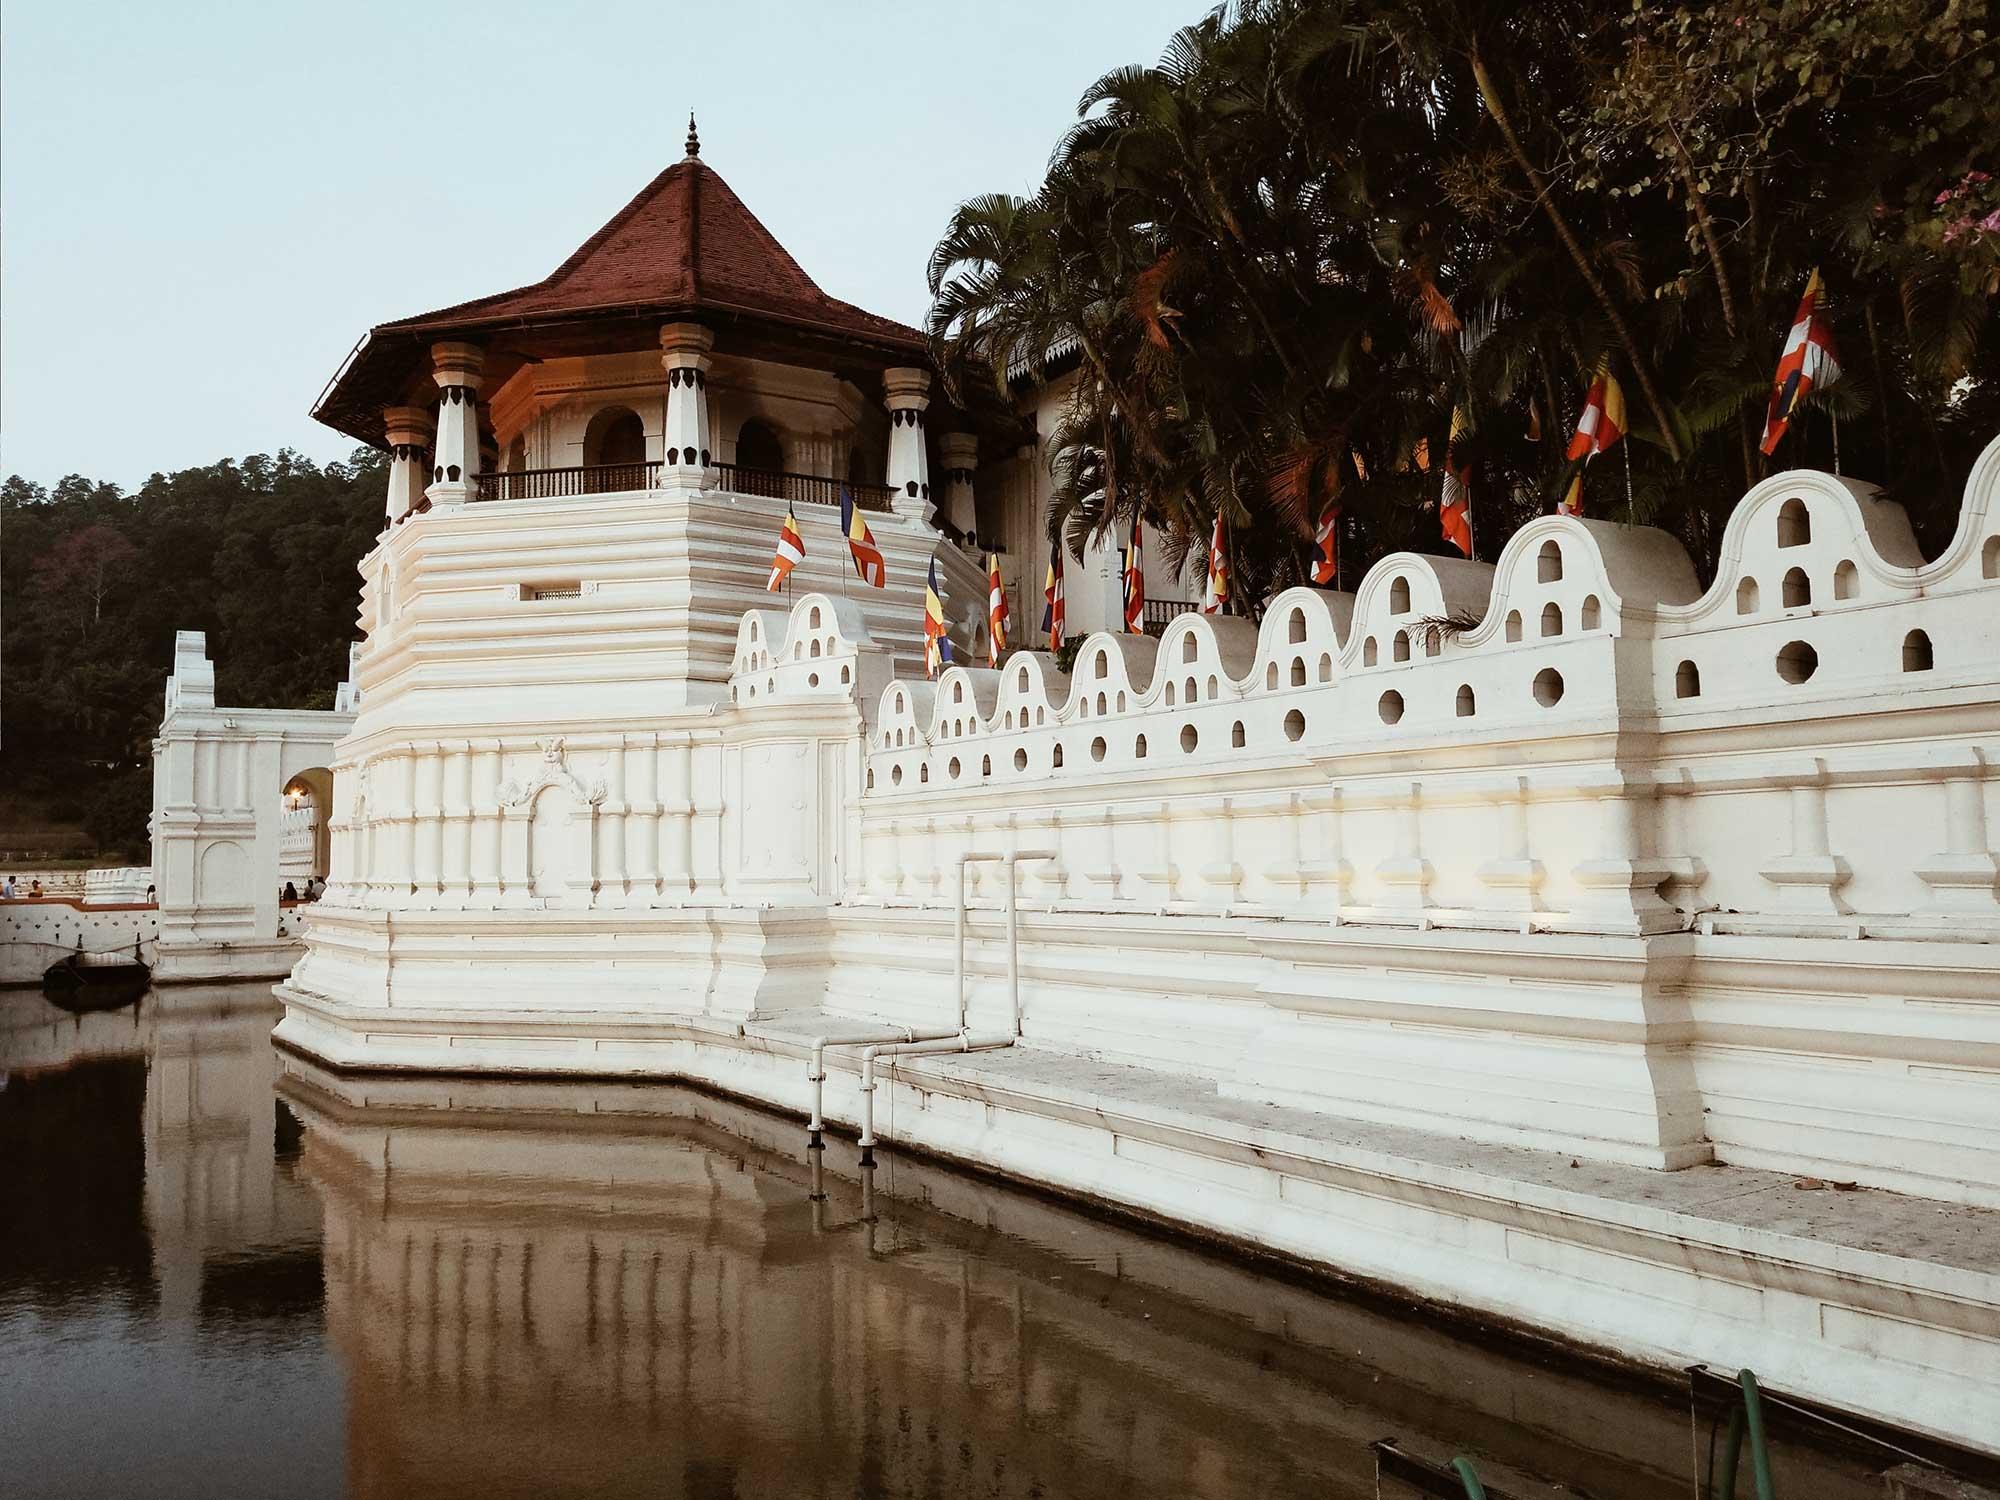 канди, свещен зъб, храм